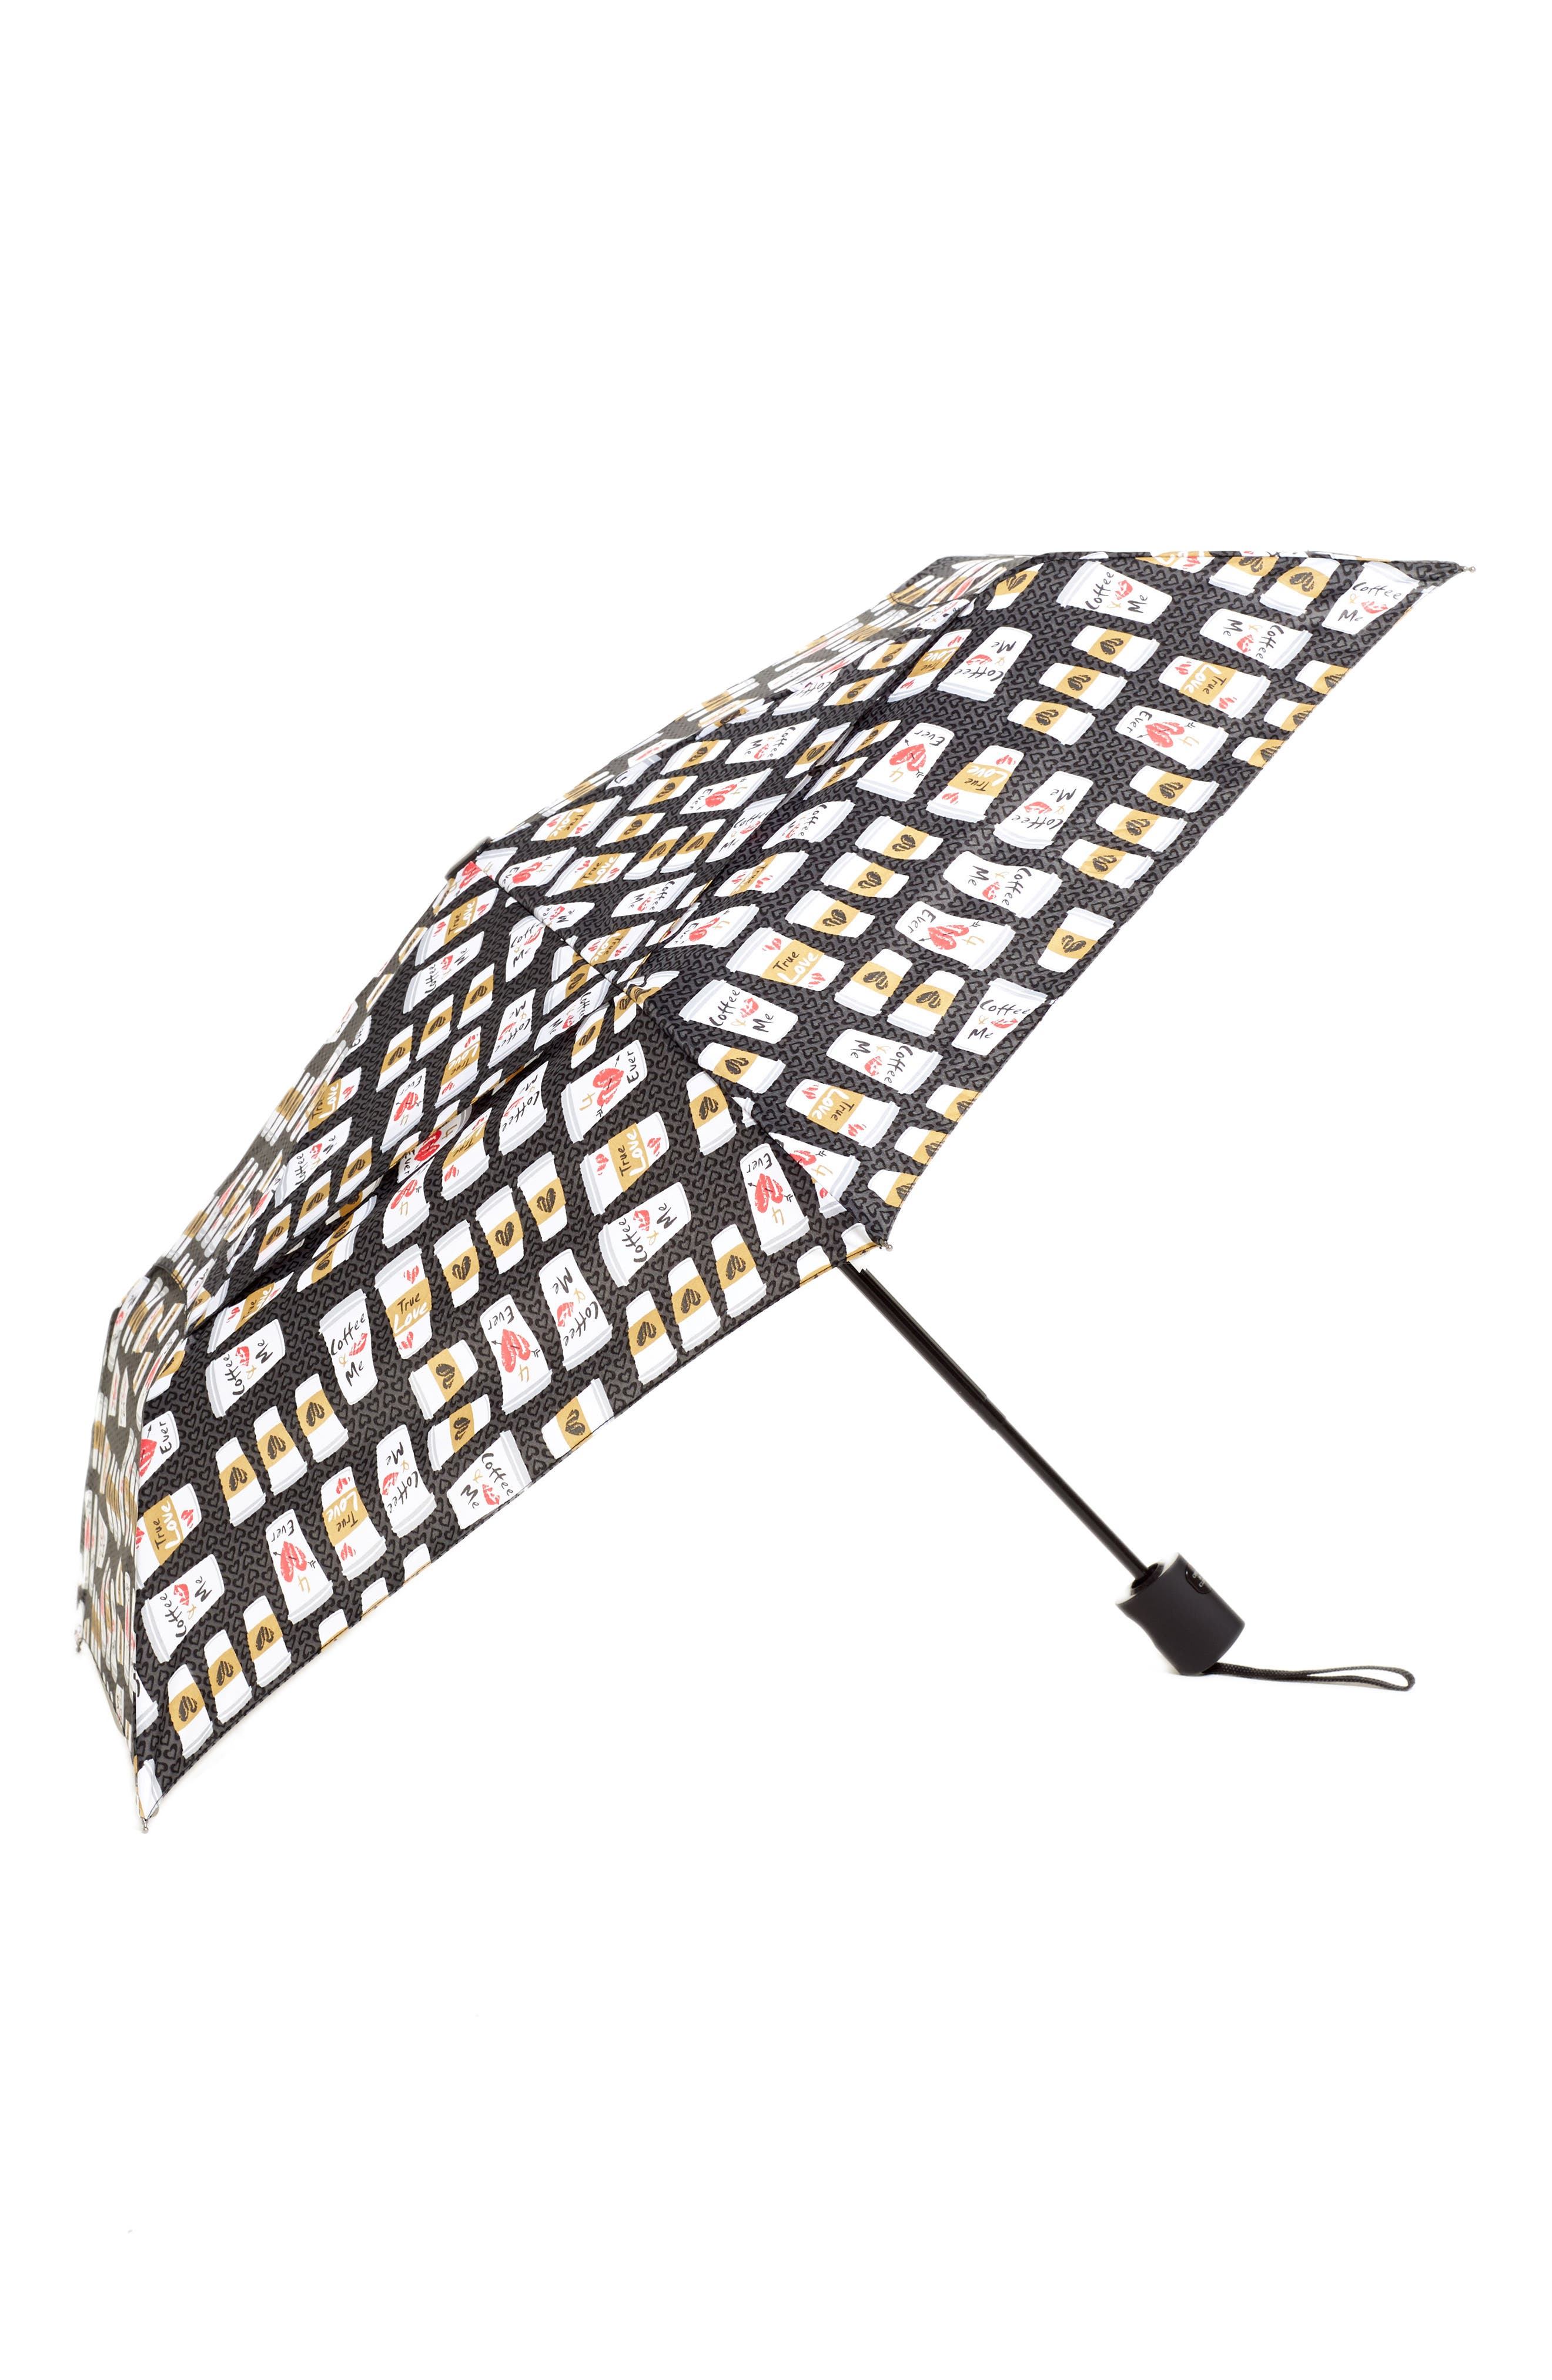 WindPro<sup>®</sup> Auto Open & Close Umbrella,                             Main thumbnail 1, color,                             NORD BREWED